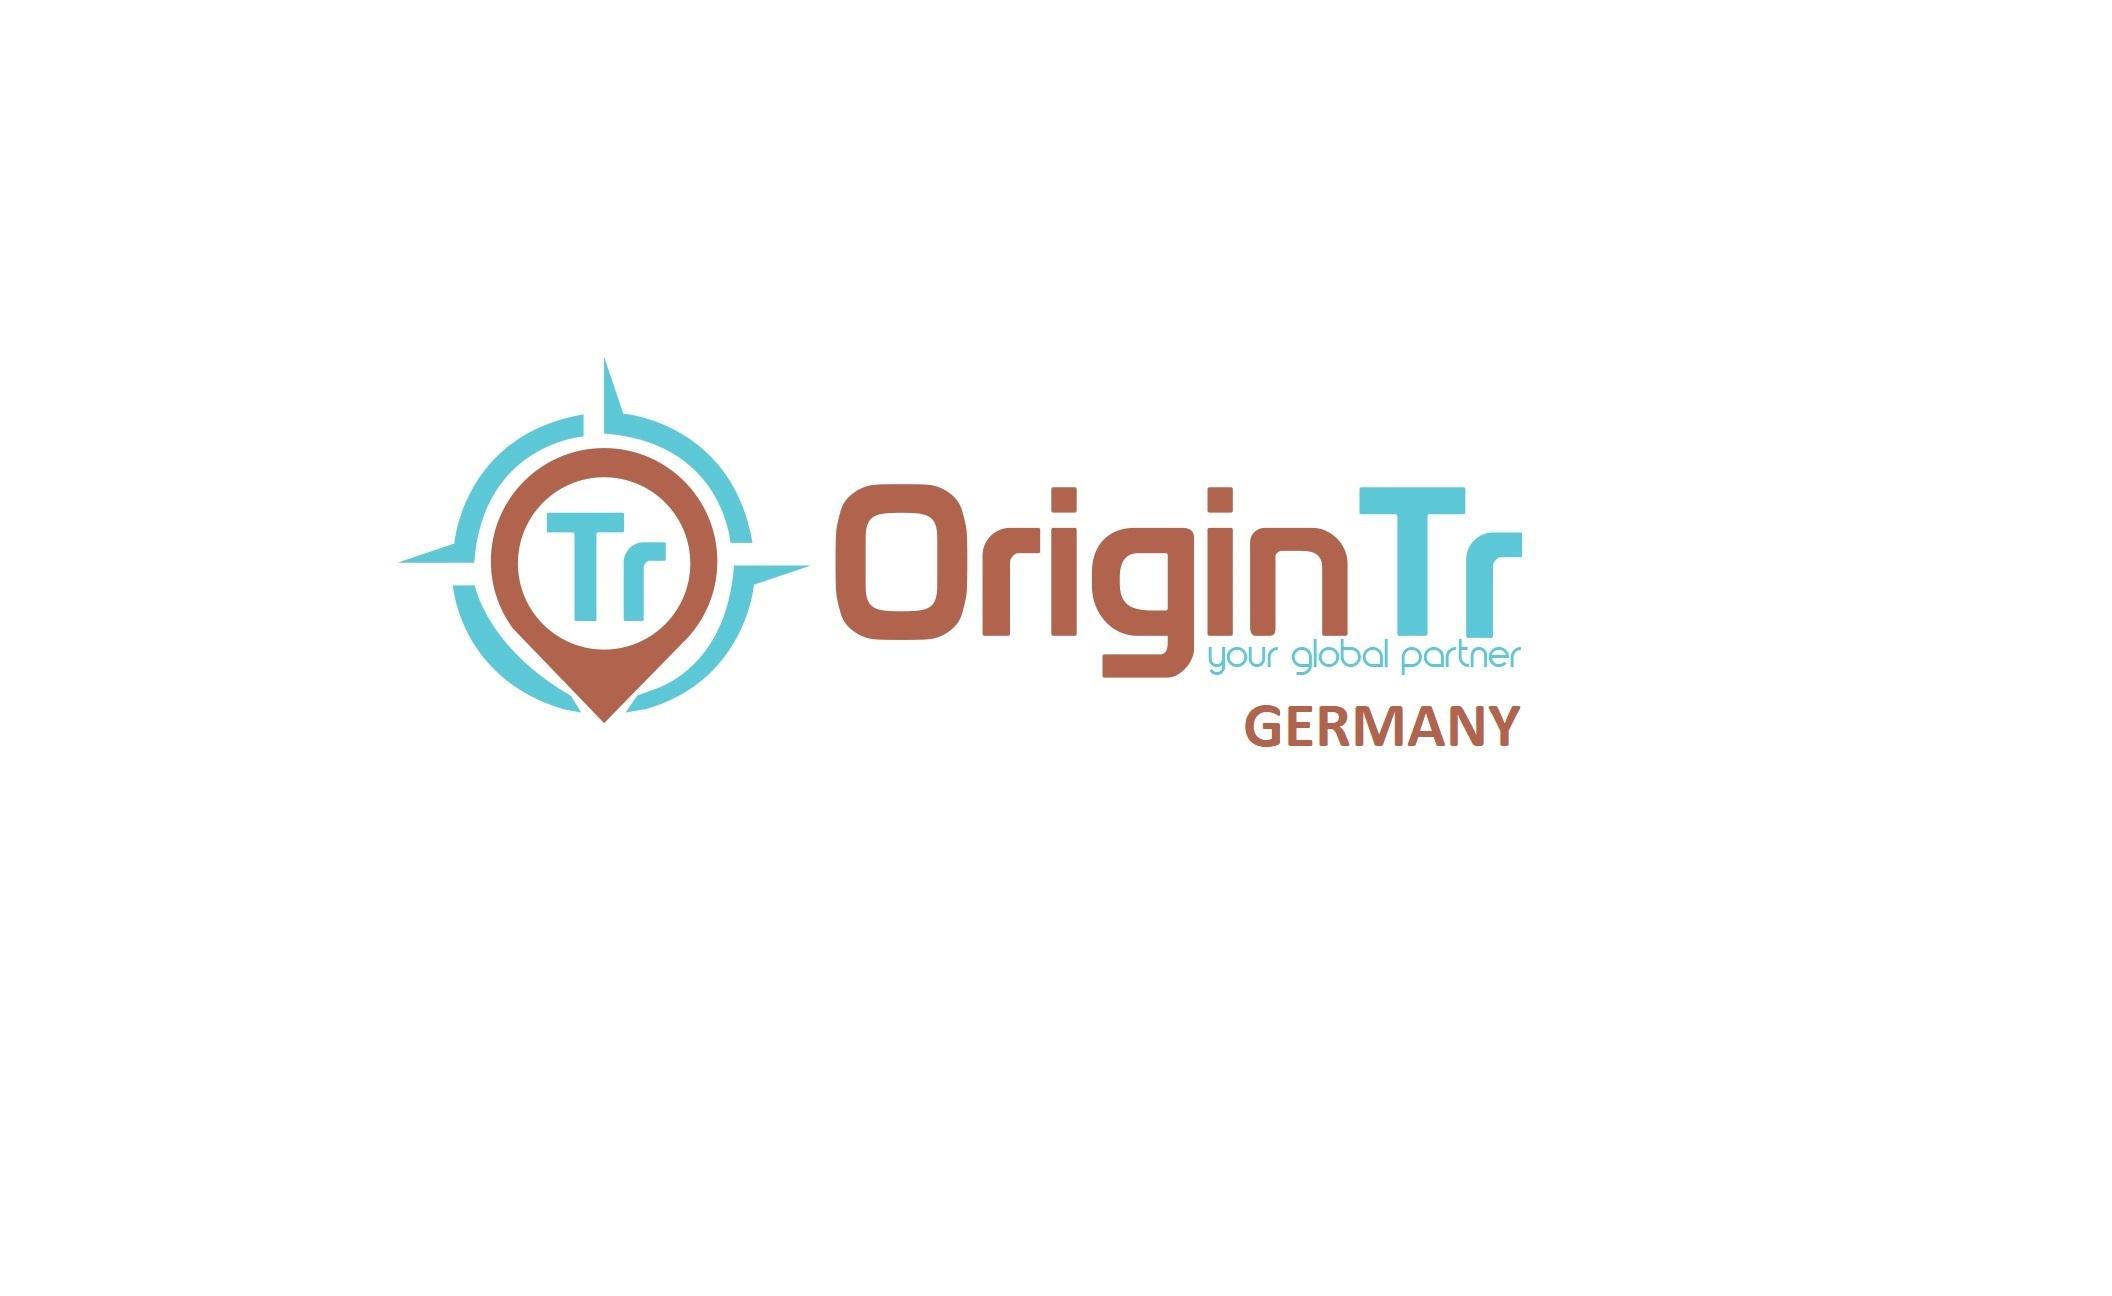 OriginTR Germany